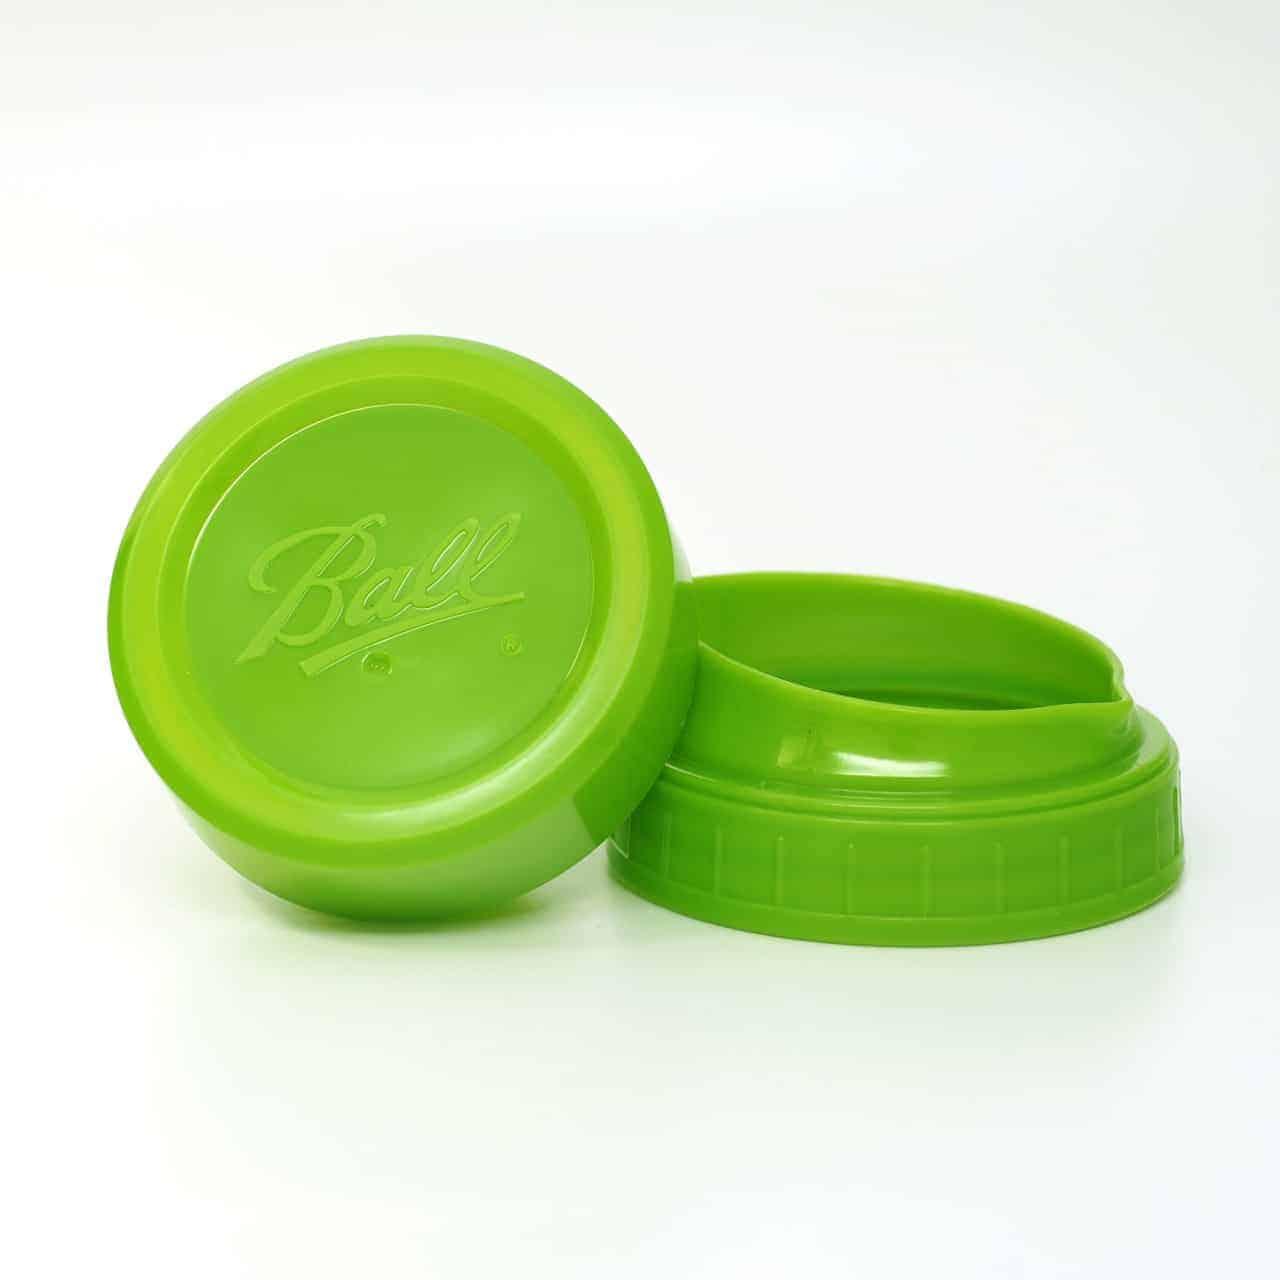 Mason Jars With Handles Related Keywords & Suggestions - Mason Jars ...